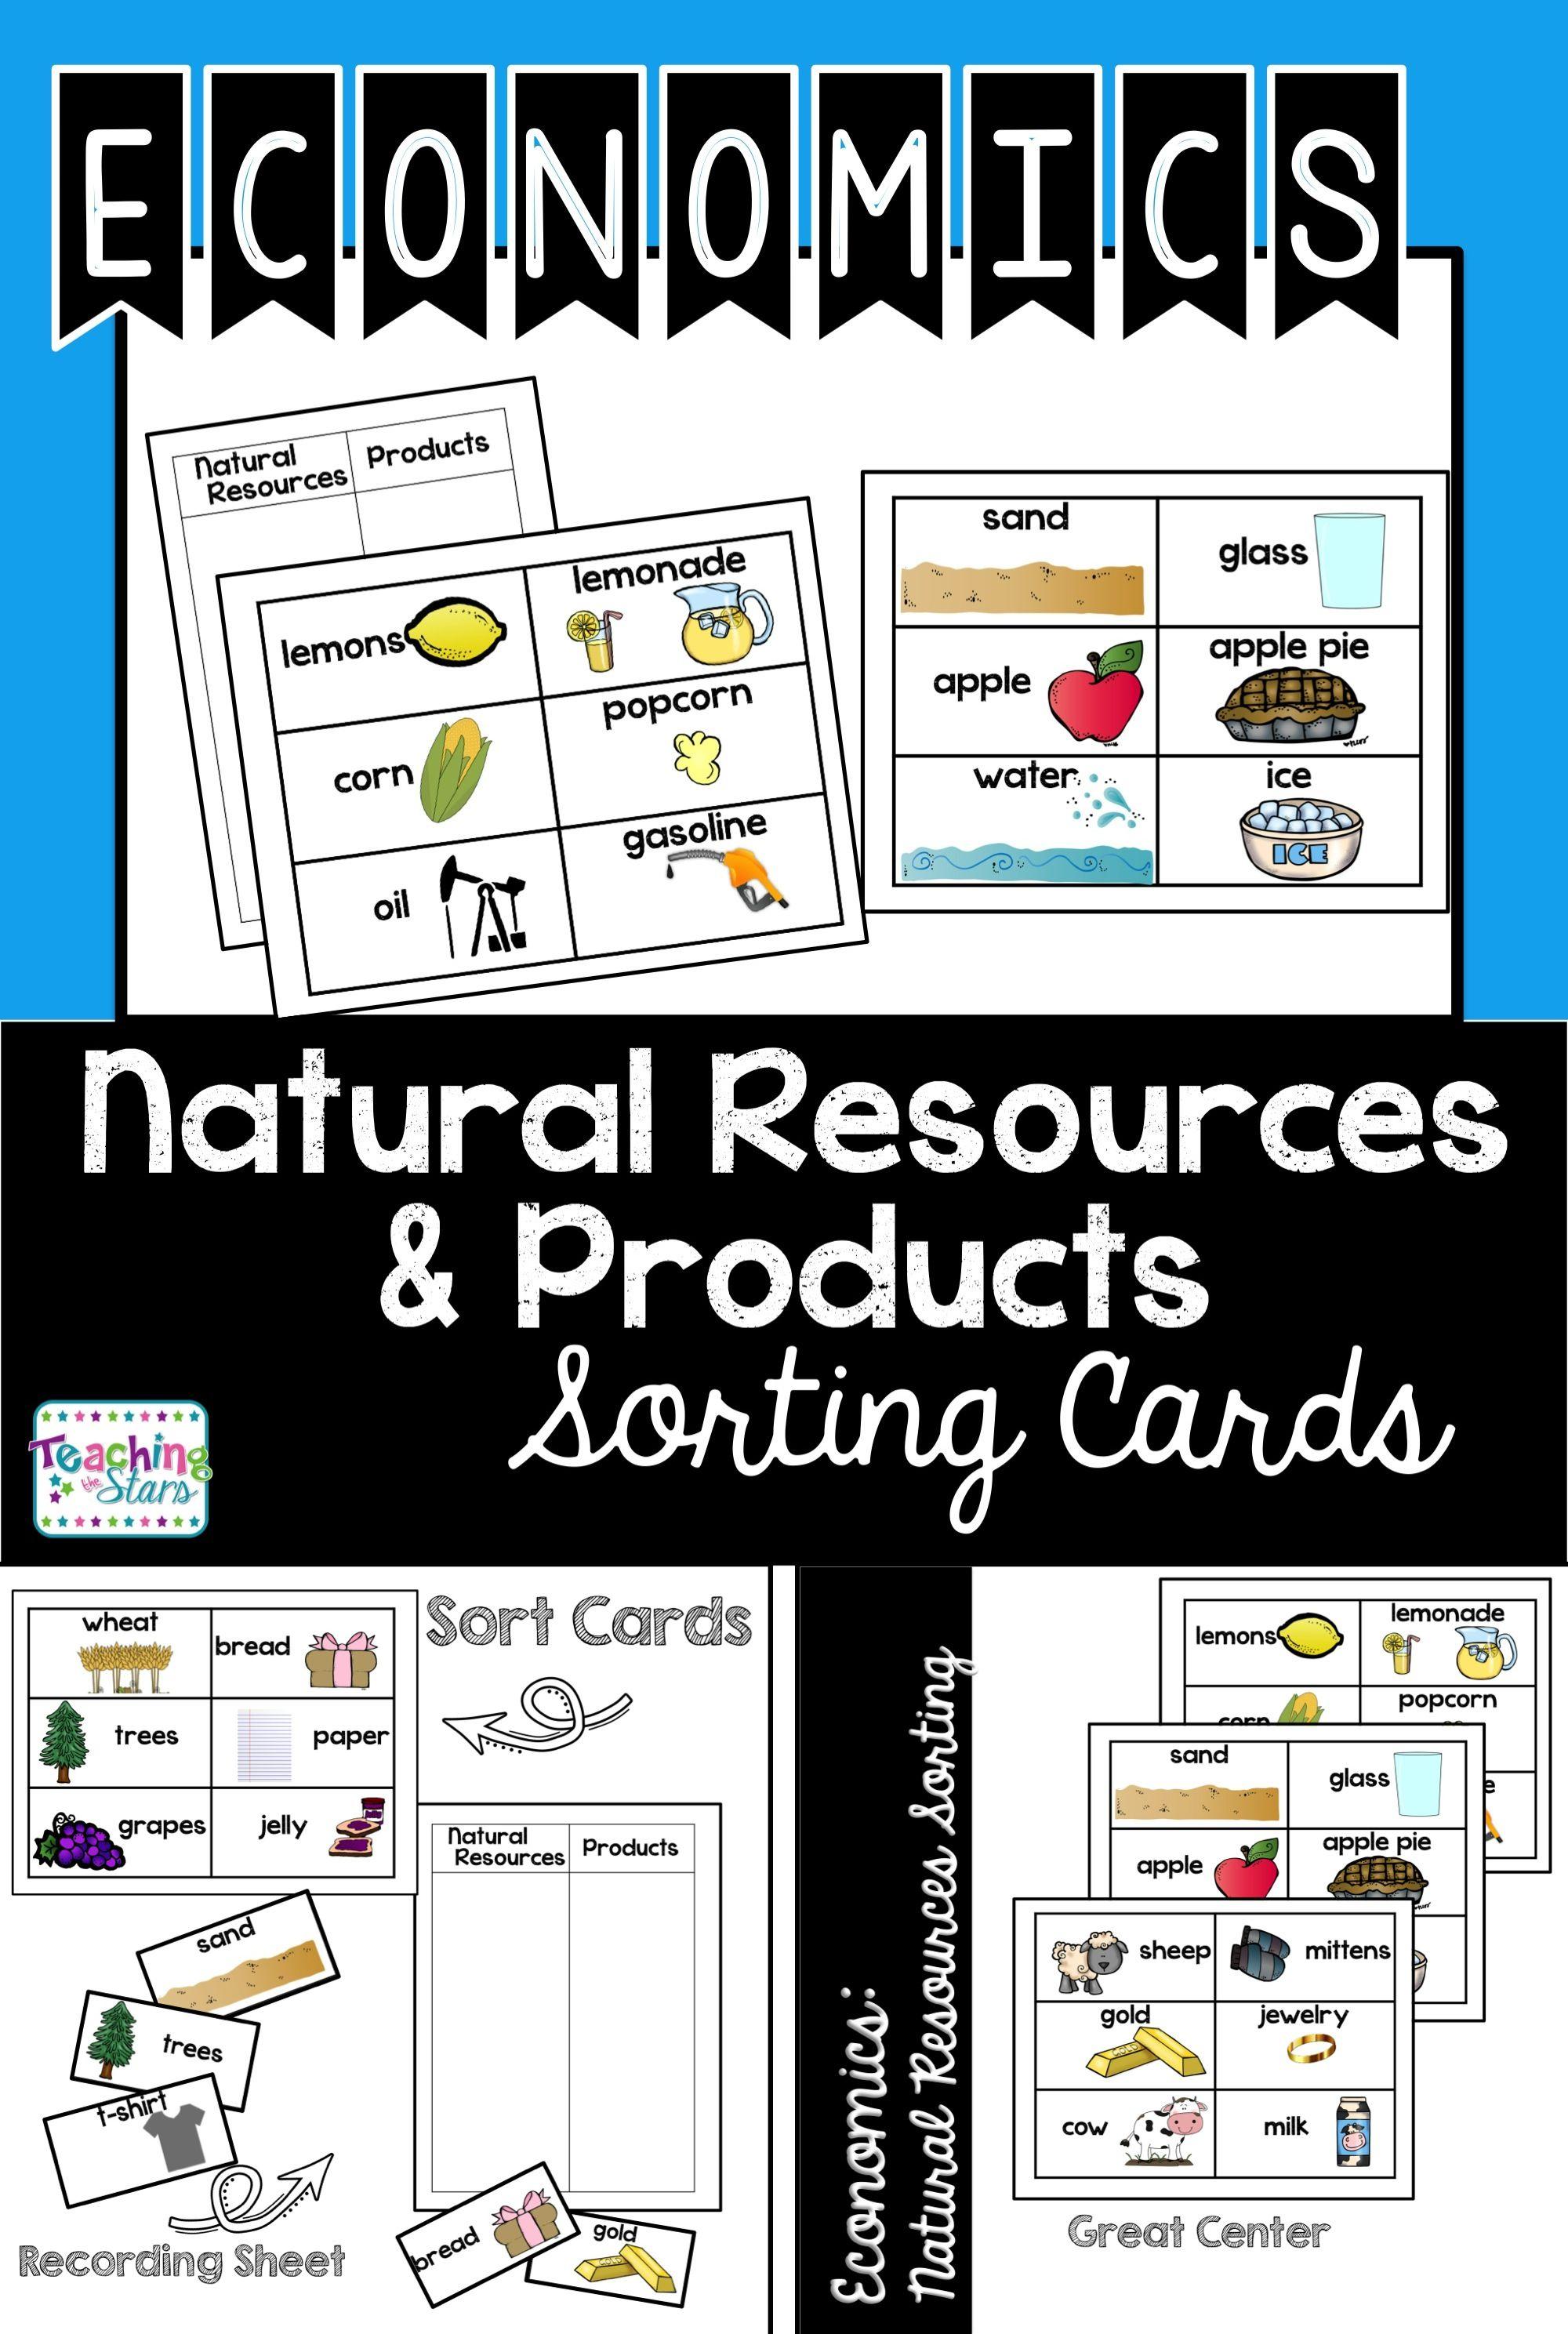 Economics Natural Resources Sorting Cards